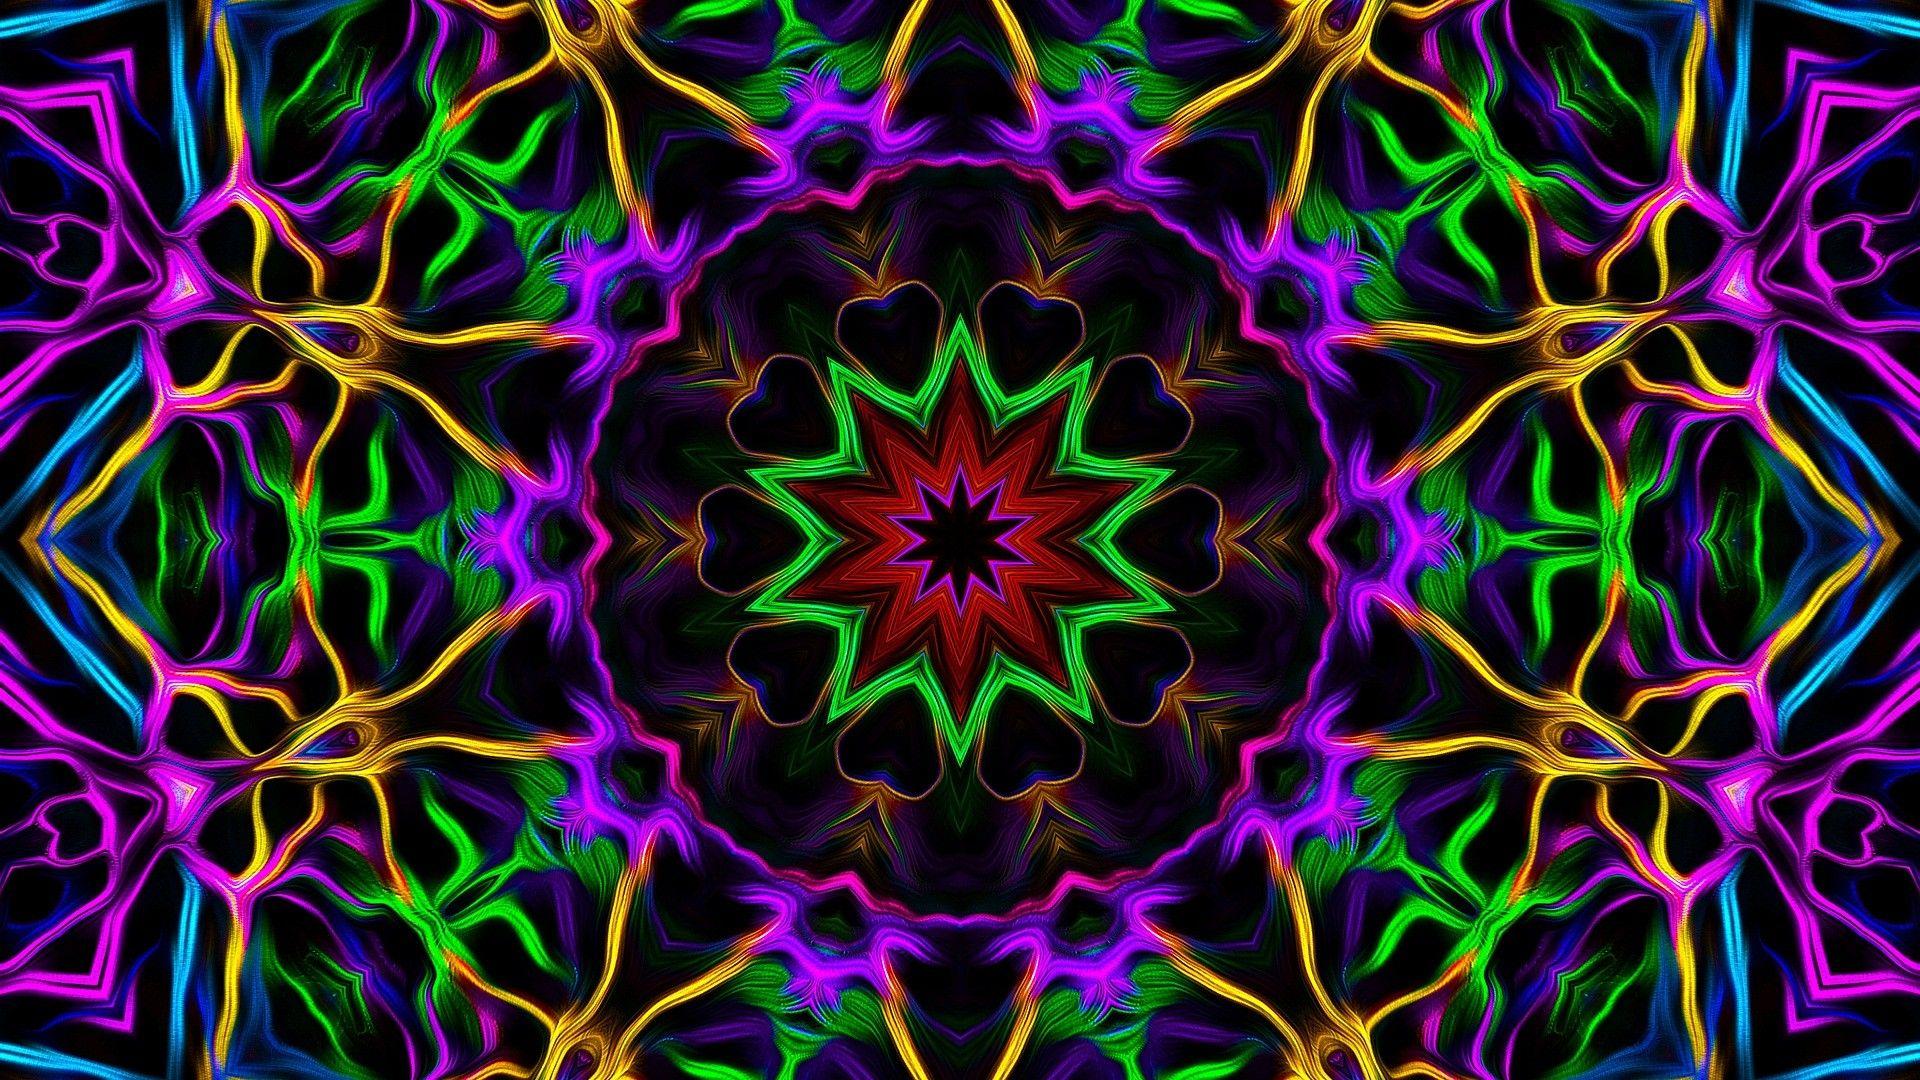 Kaleidoscope download wallpaper image